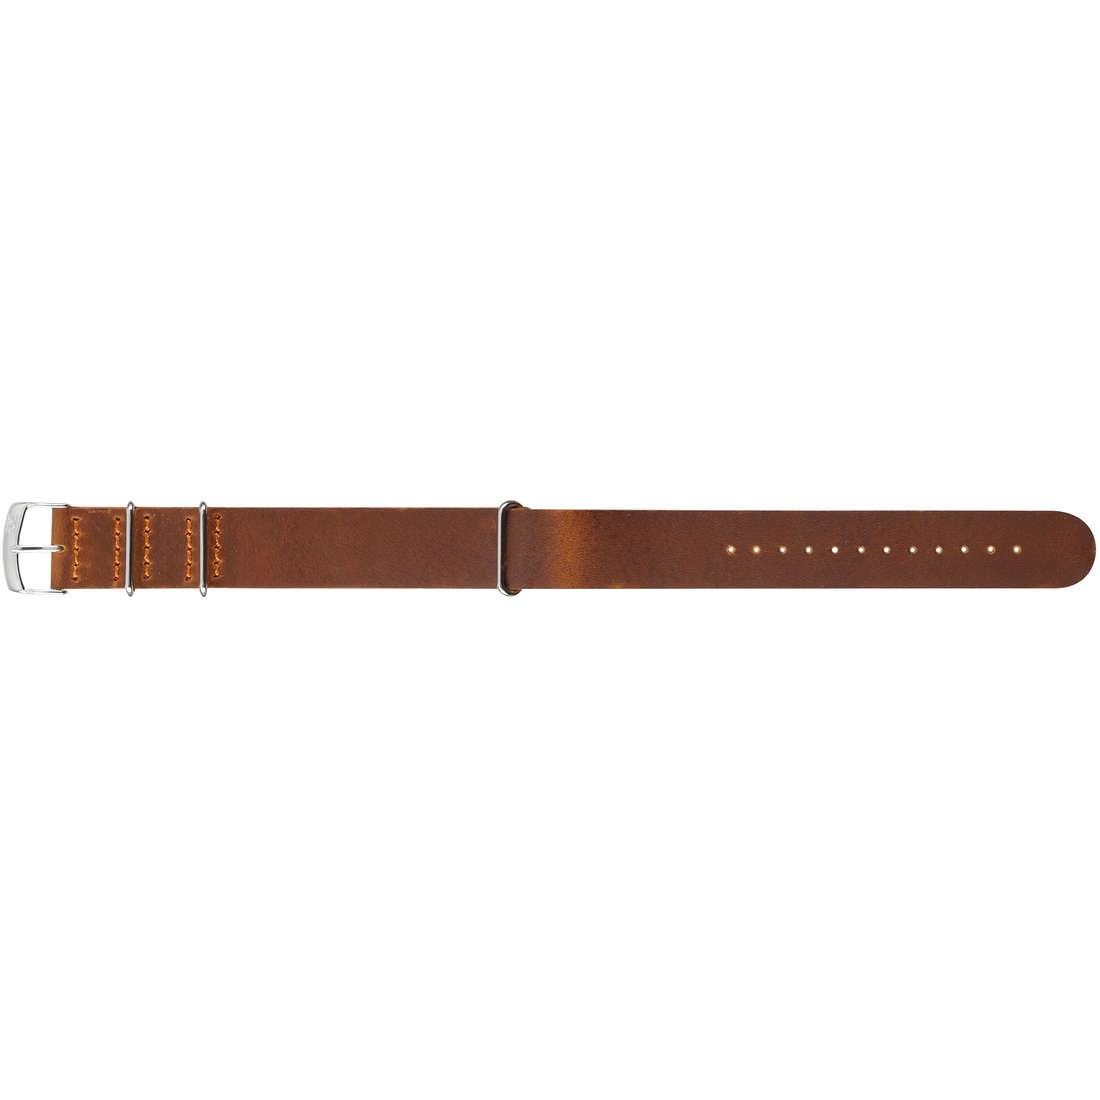 watch watch bands watch straps man Morellato Morellato 1930 A01X4499600041CR20